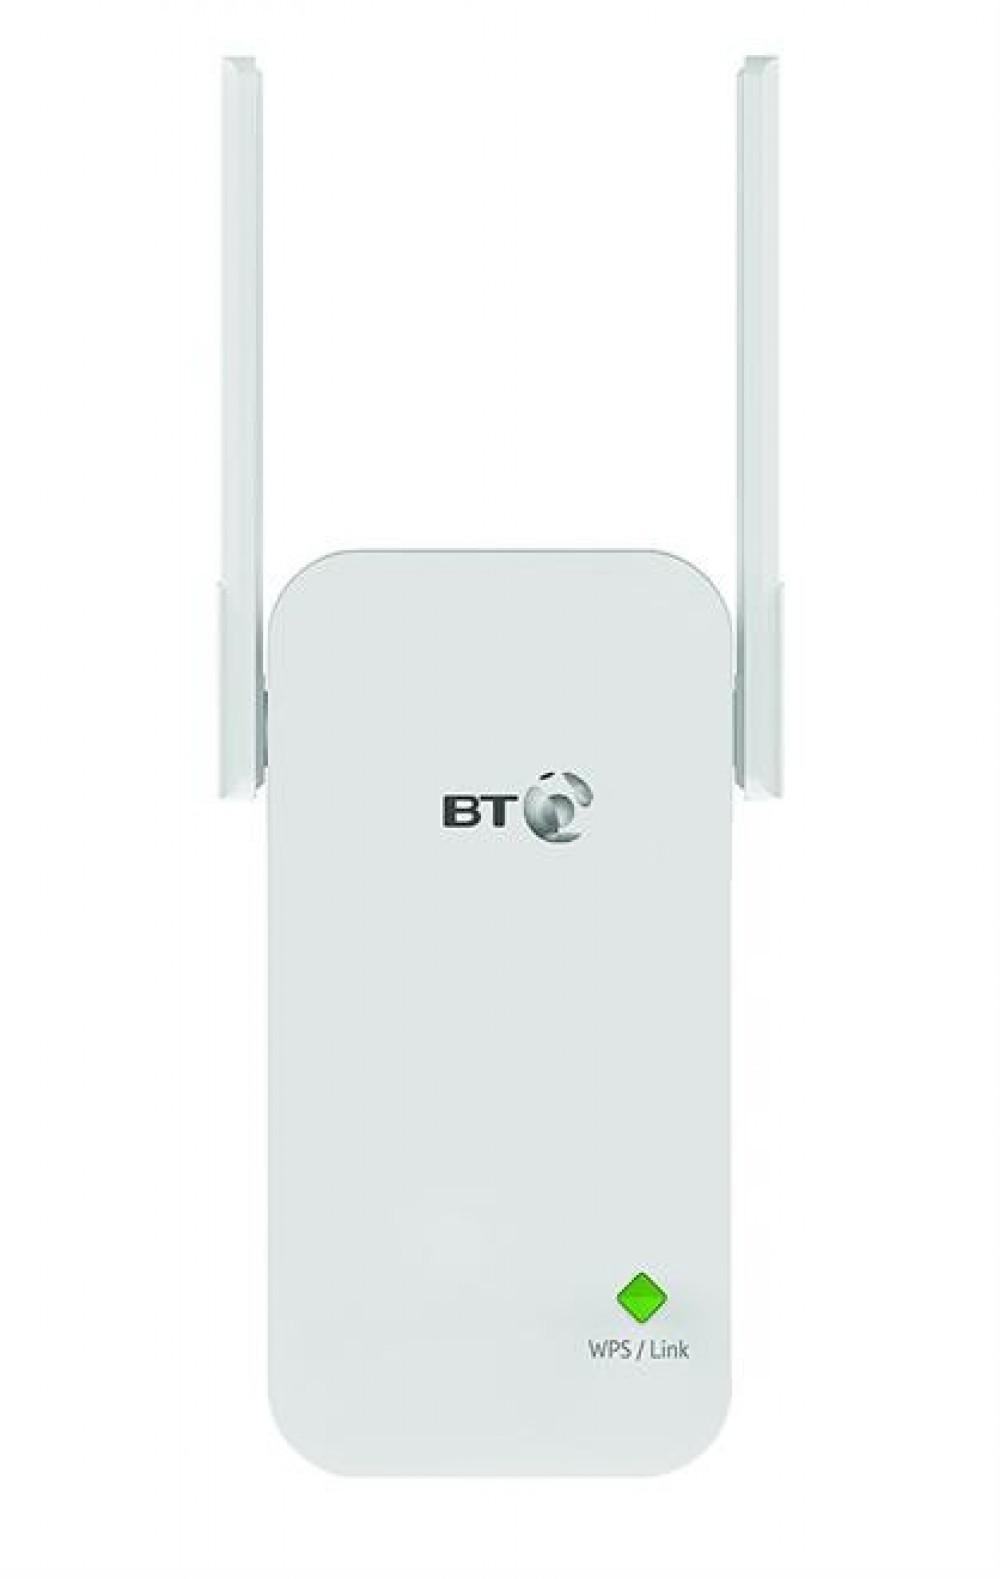 BT Essentials Wifi Extender